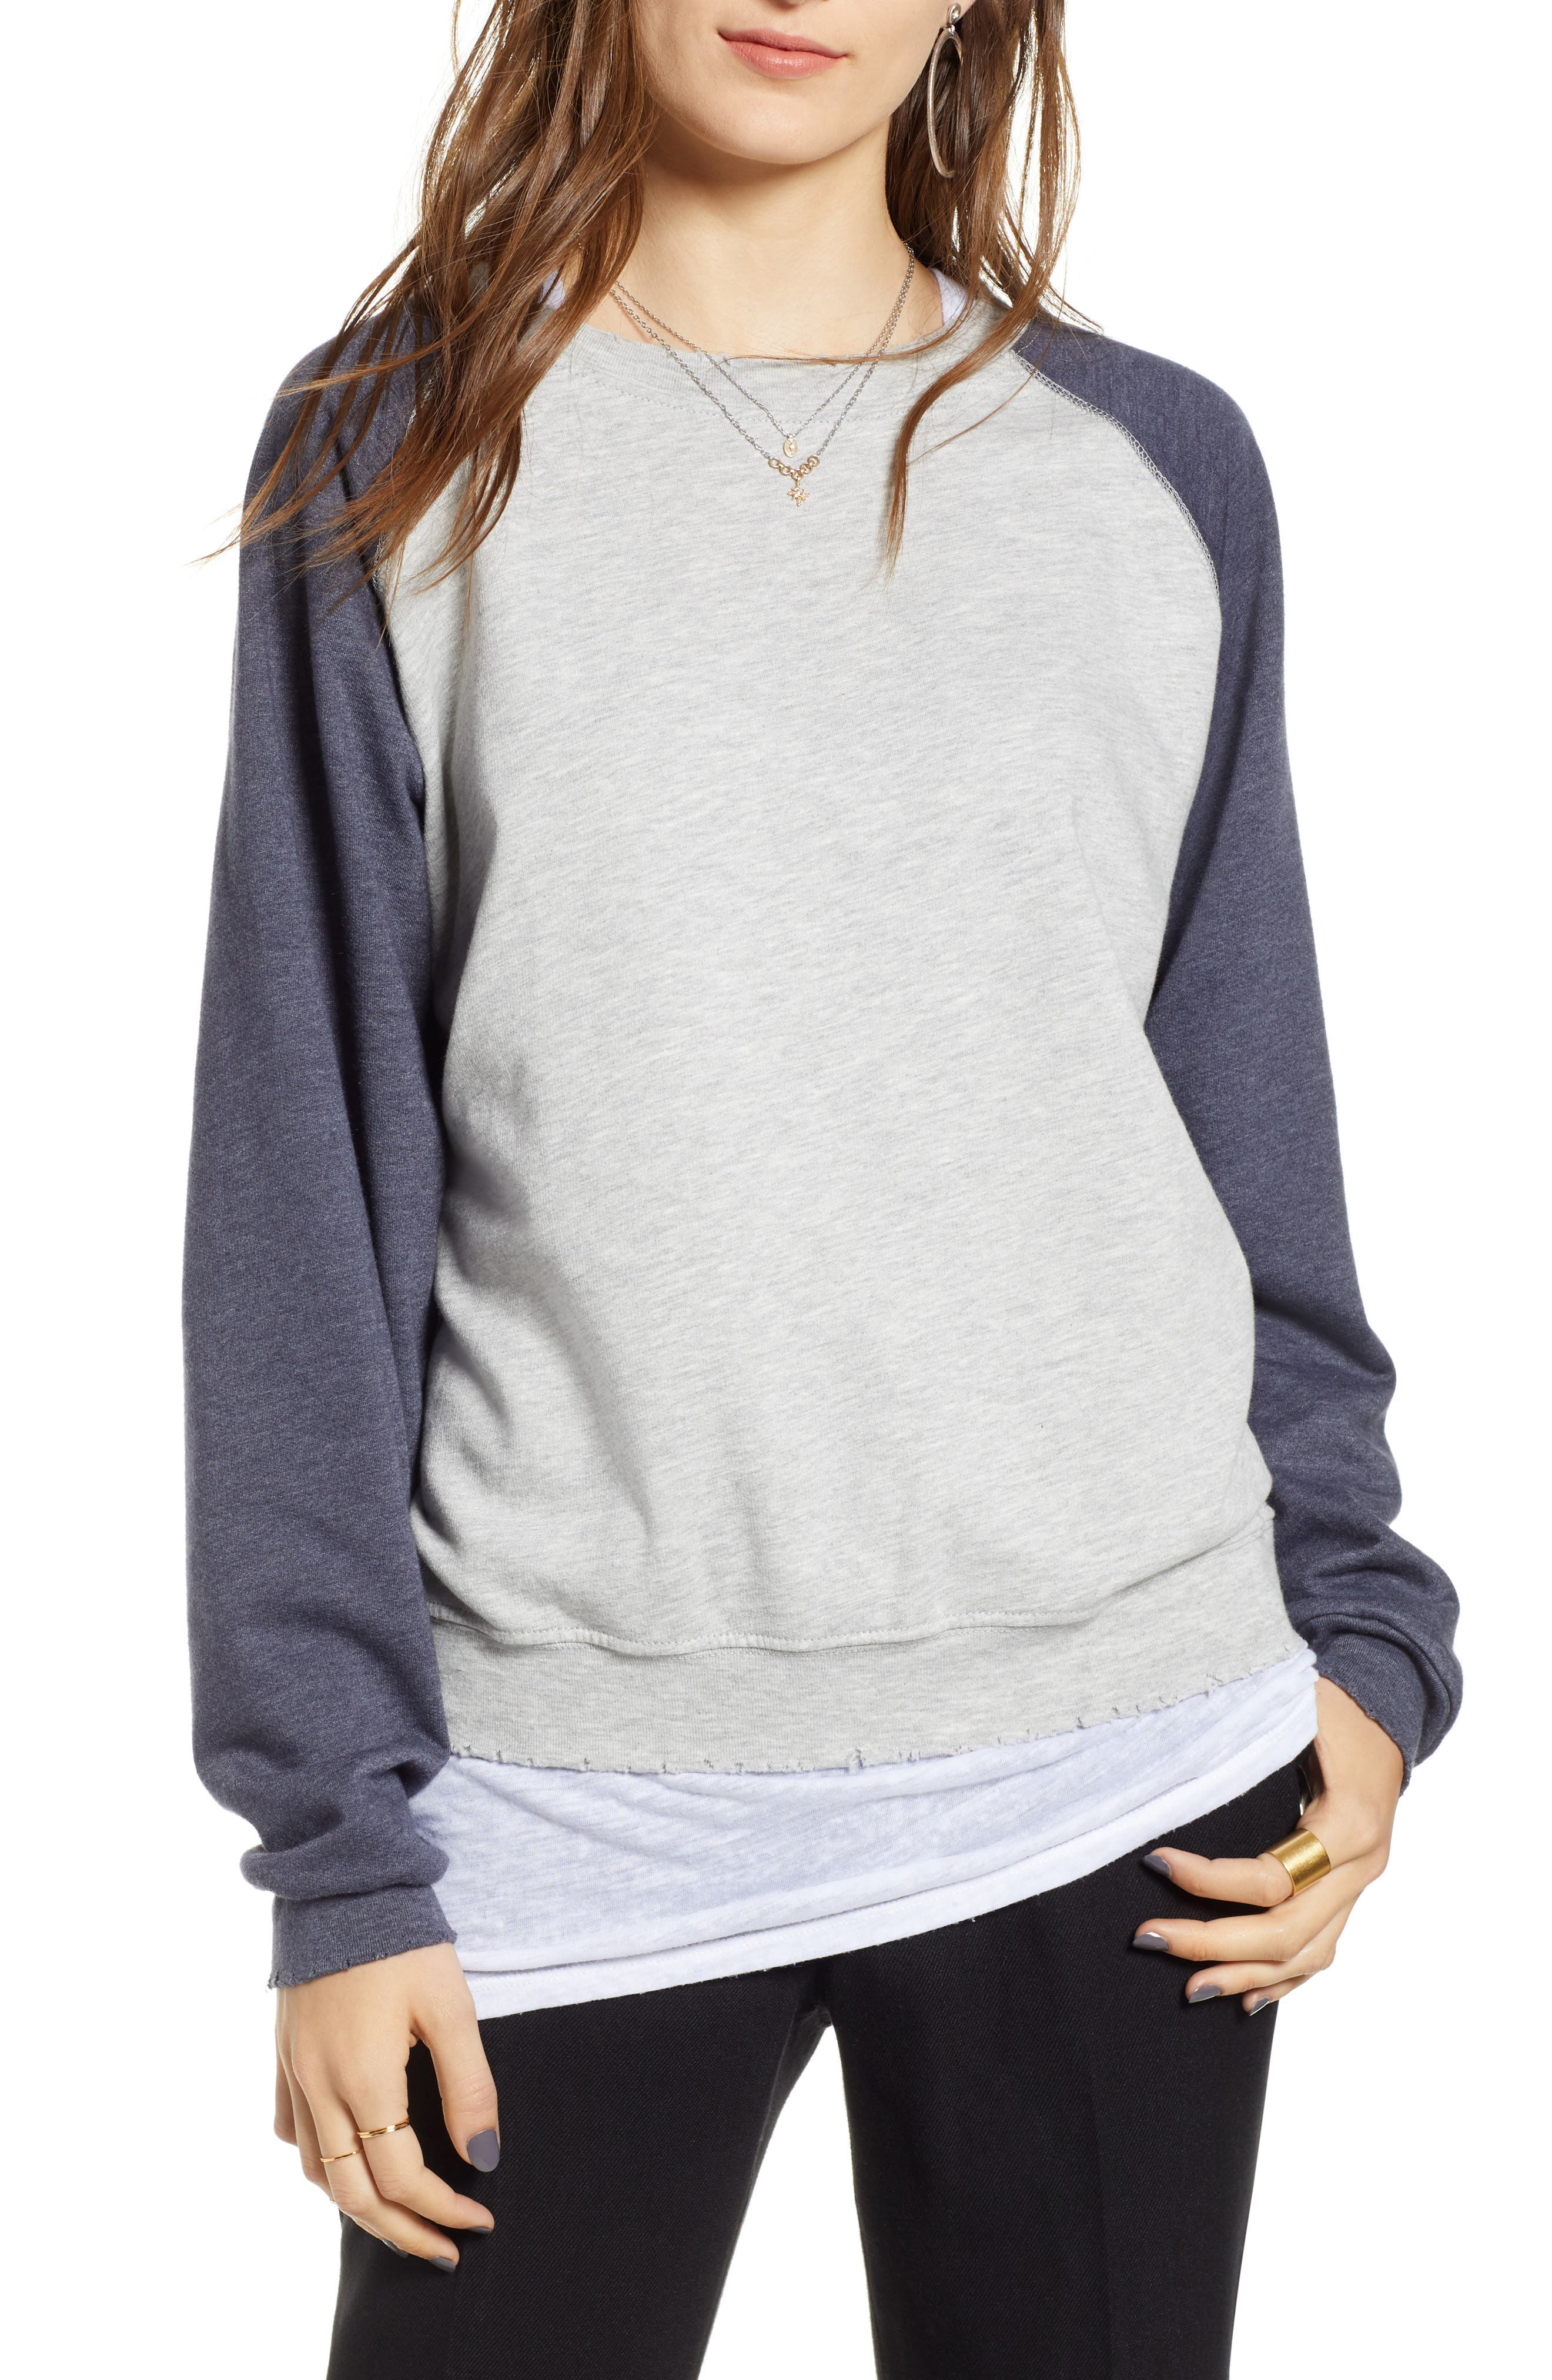 Raglan Sweatshirt,                             Main thumbnail 1, color,                             GREY HEATHER- NAVY COMBO